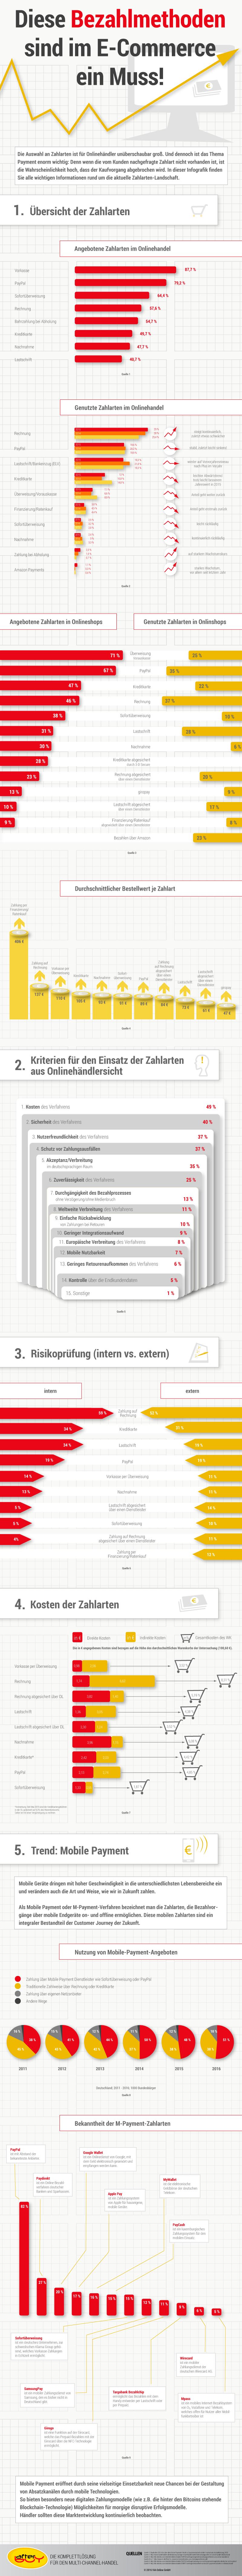 Infografik: Zahlungsarten im Onlinehandel